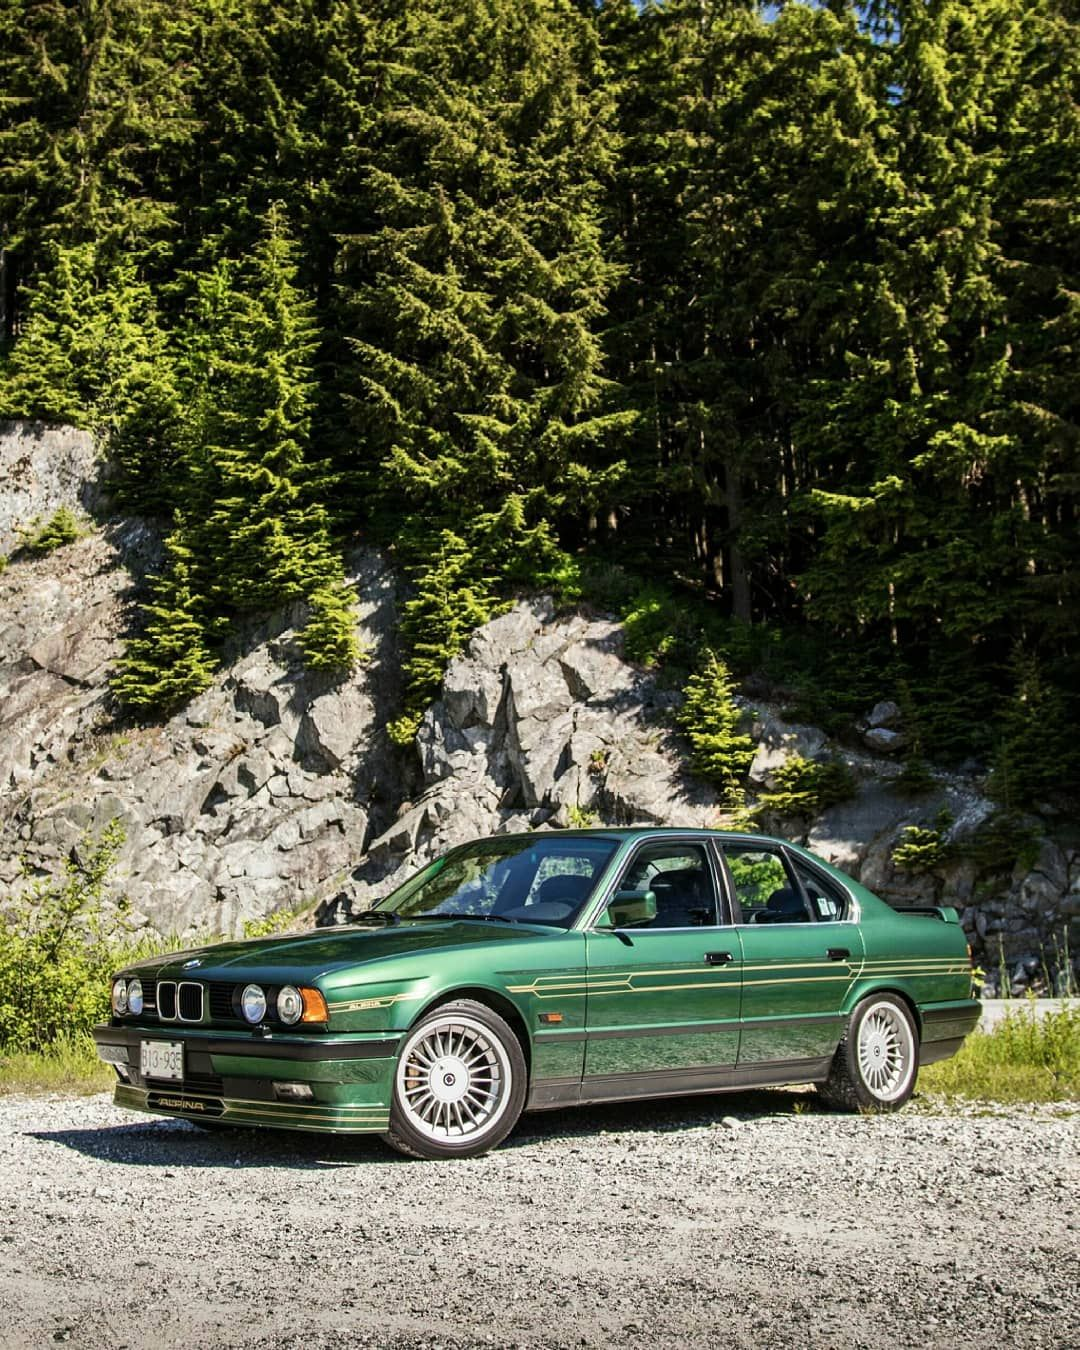 Alpina B10 Biturbo E34 Bmwalpina Alpinab10 Bmwe34 E34 Bmw5er